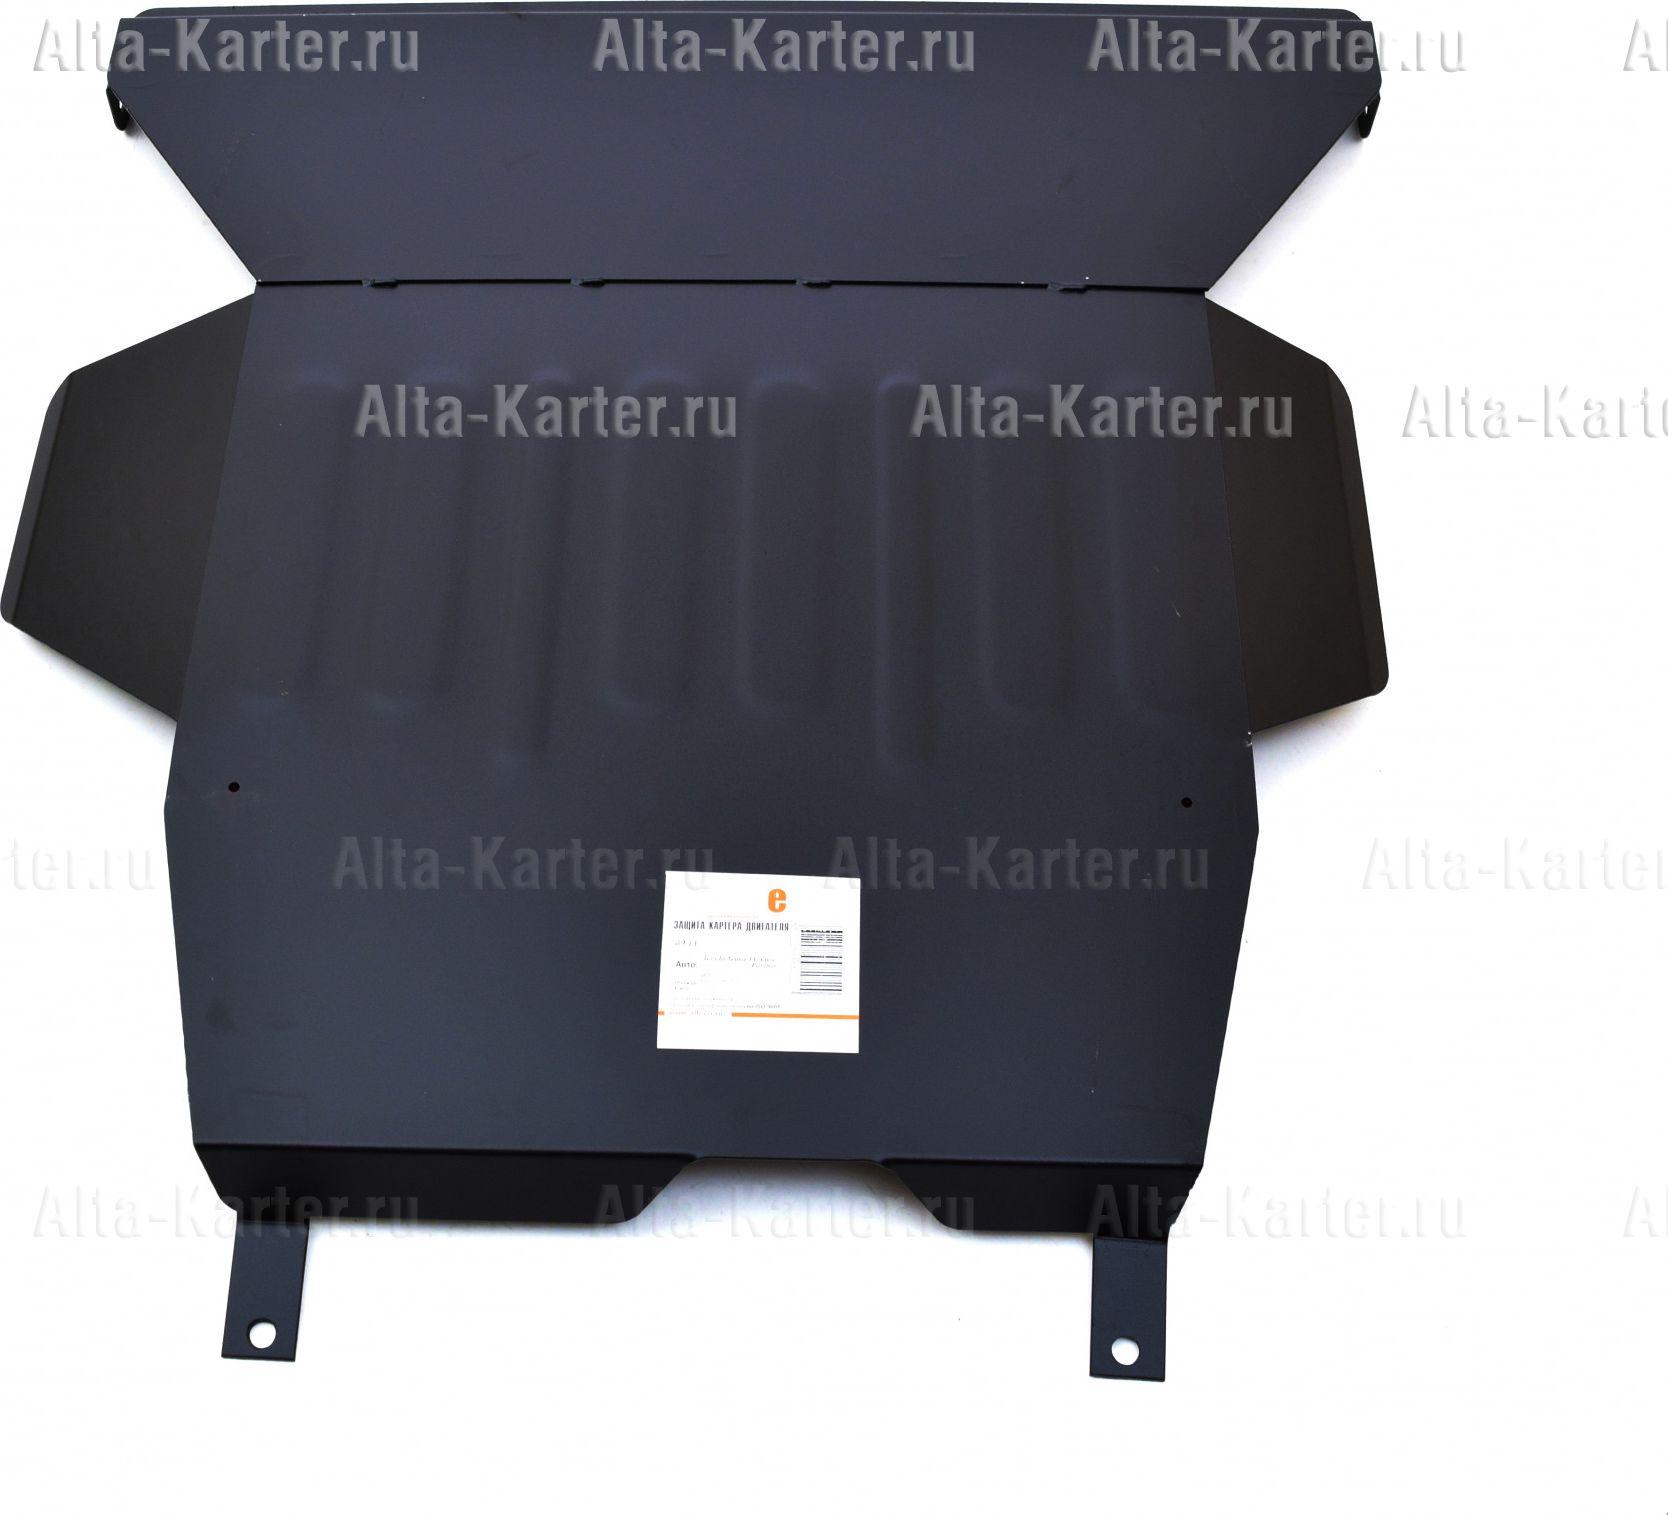 Защита Alfeco для картера и КПП Acura EL 1995-2000. Артикул ALF.09.11